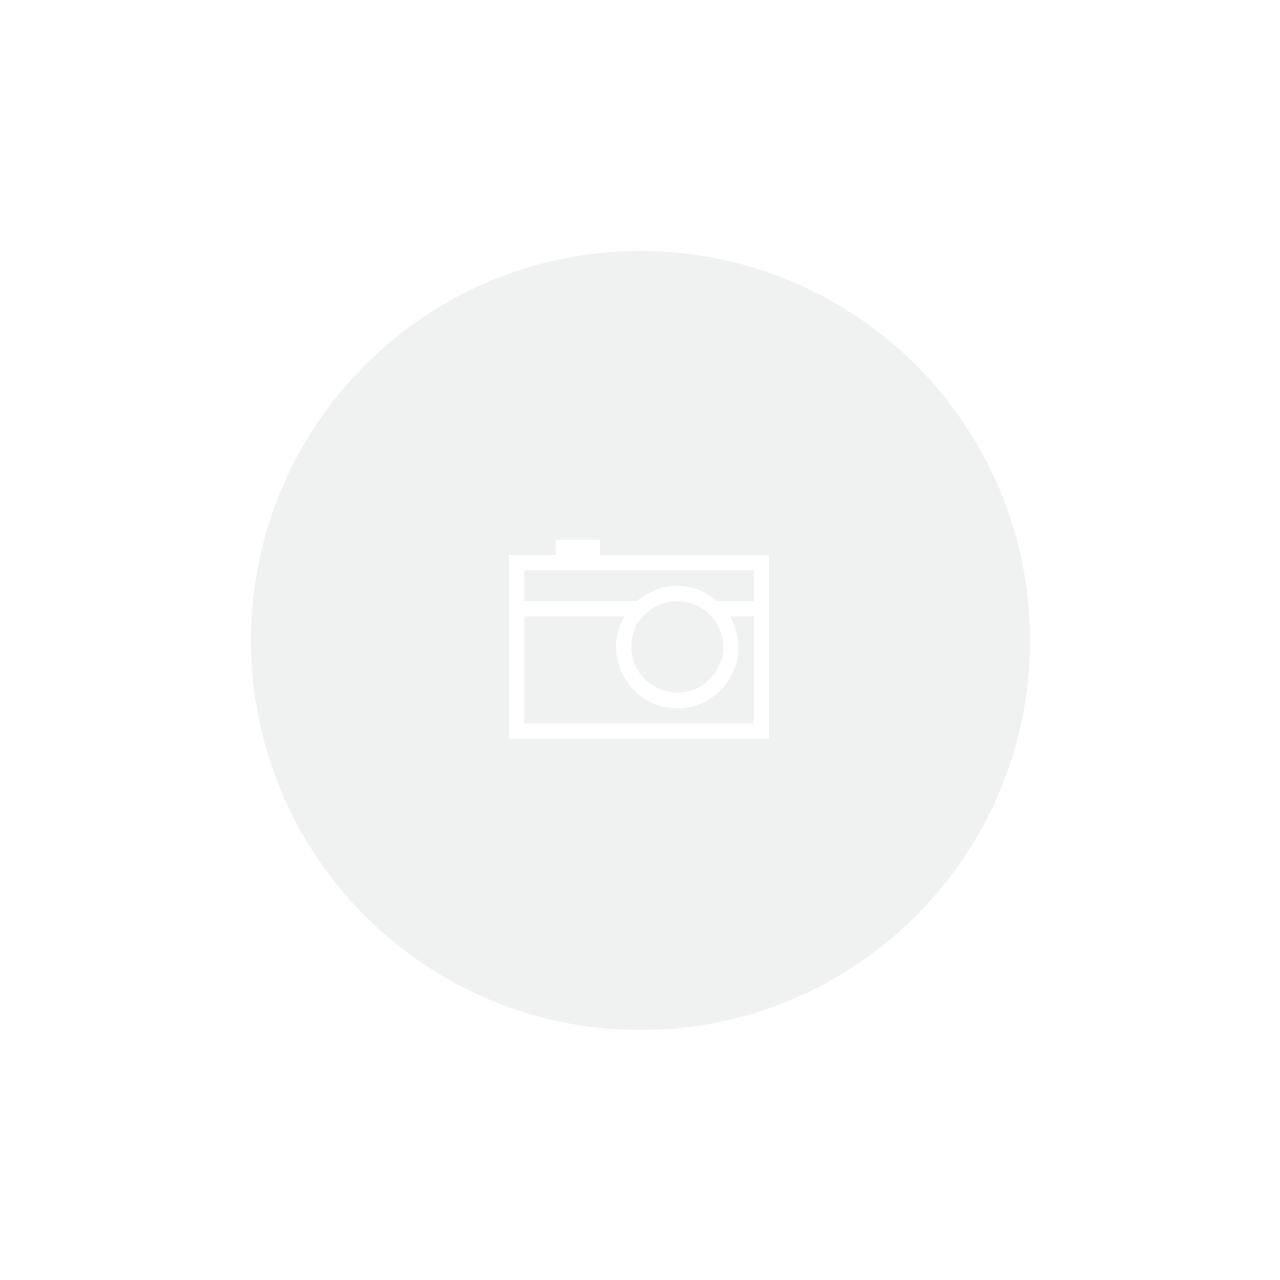 Pasta de Limpeza para Vidros/vitrocerâmica Tramontina